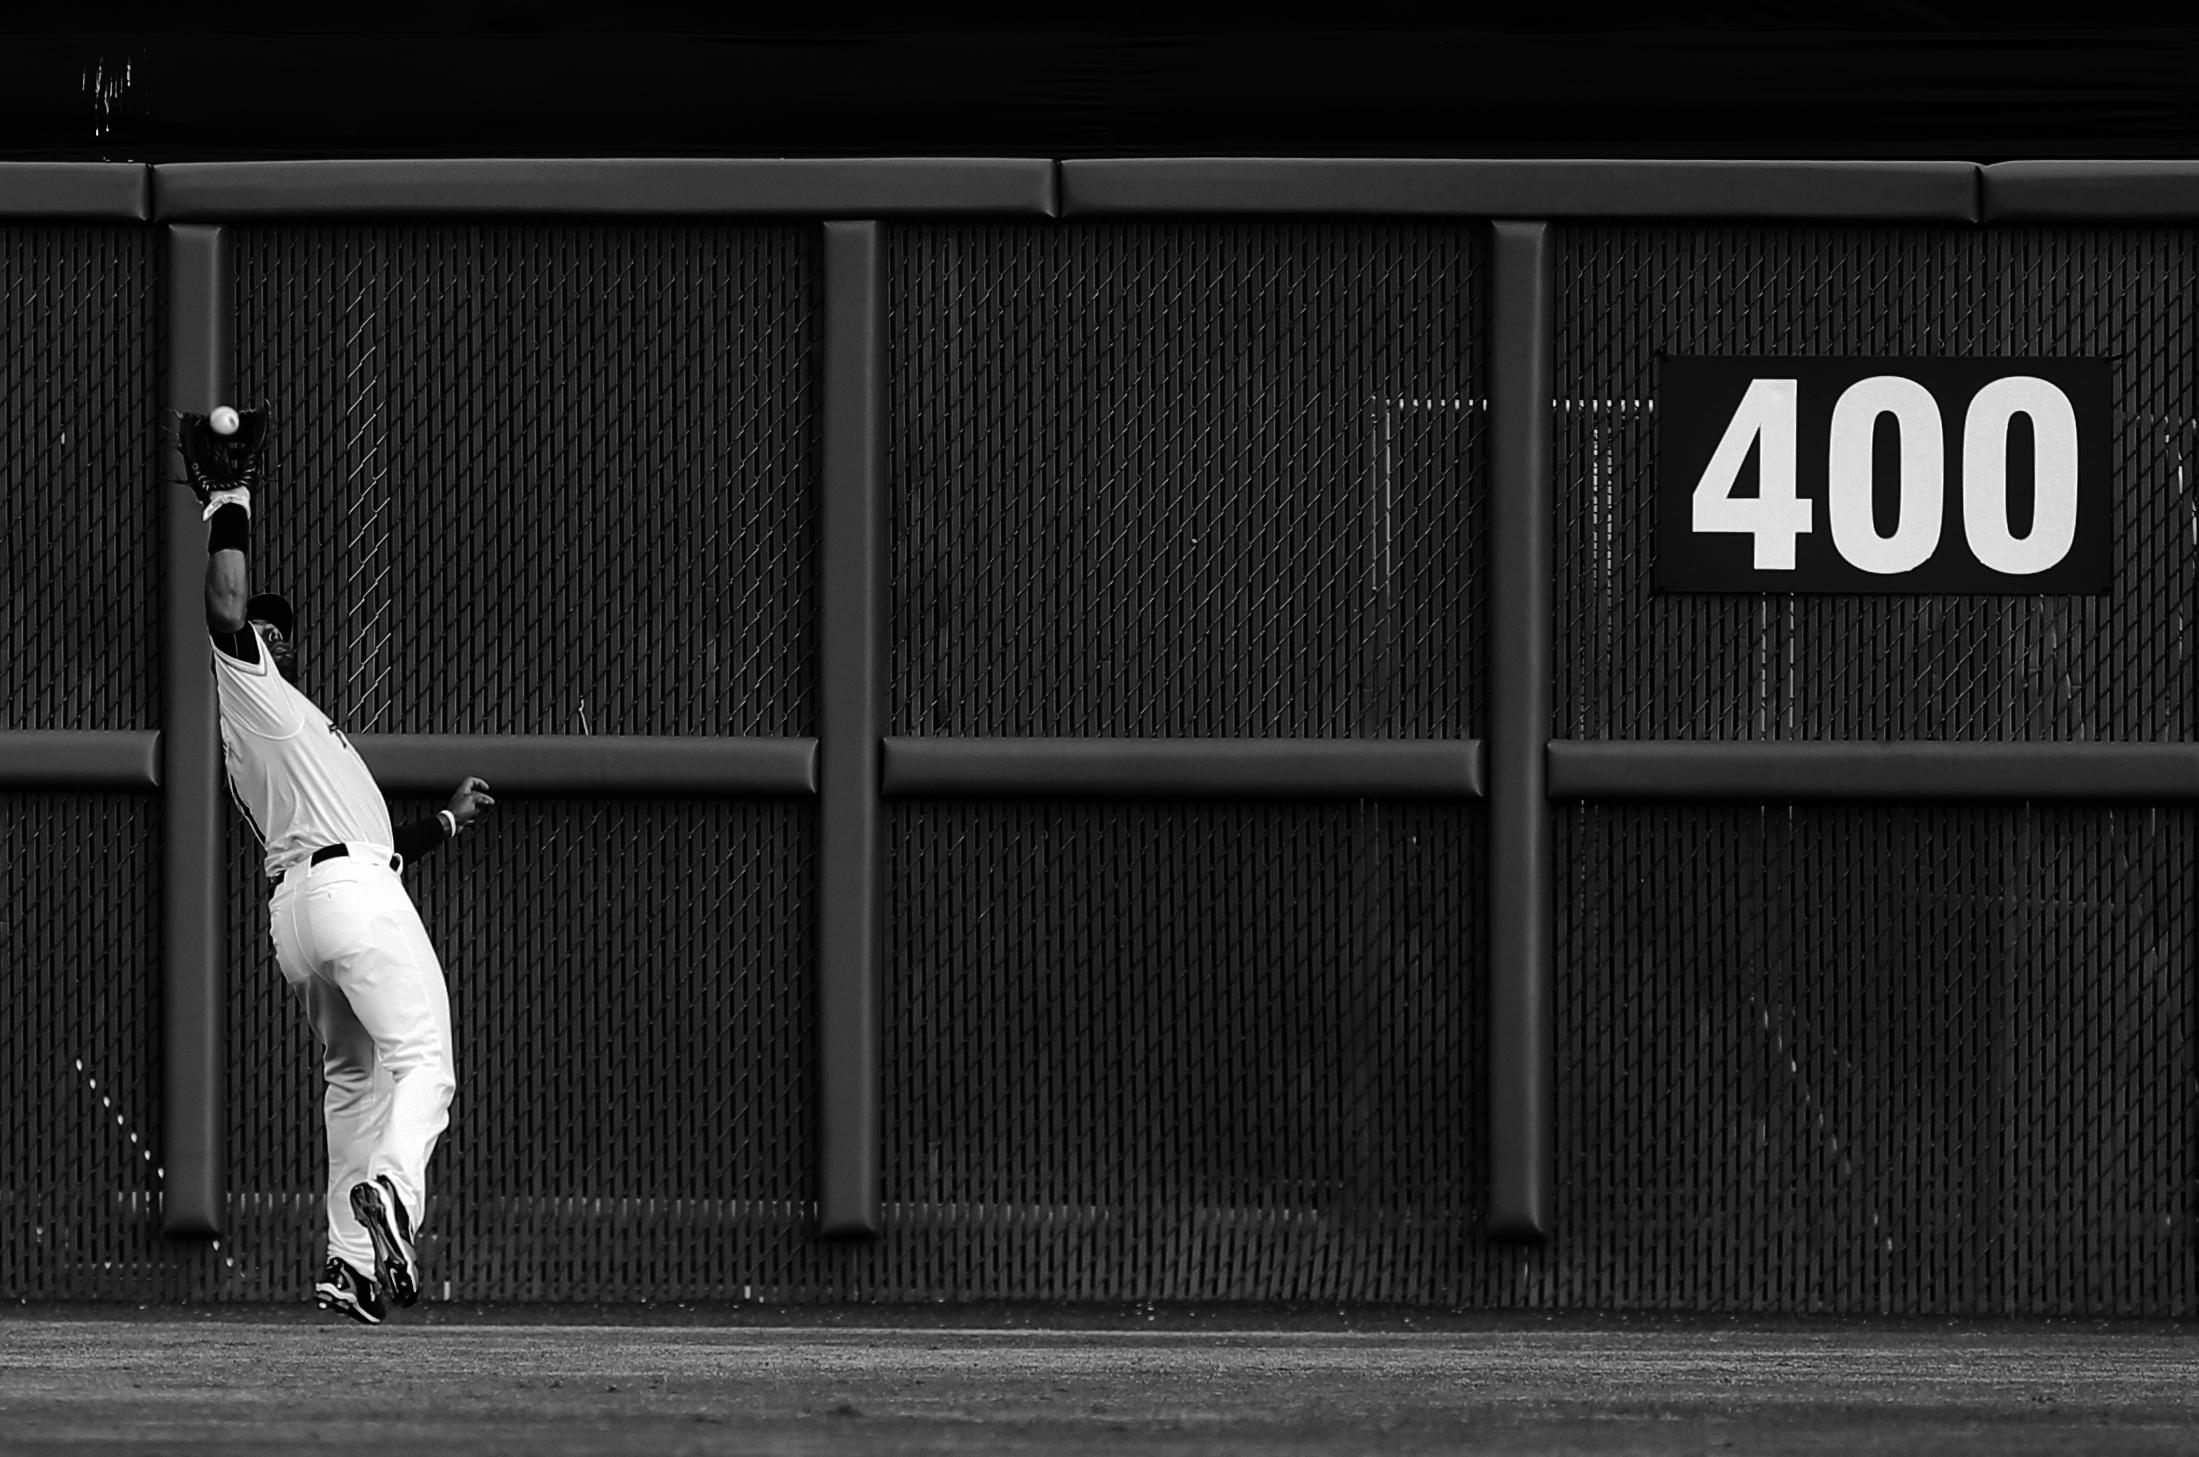 Tides centerfielder Chris Dickerson hauls in a fly ball off the bat of Gwinnett's Ozzie Albies in Norfolk.